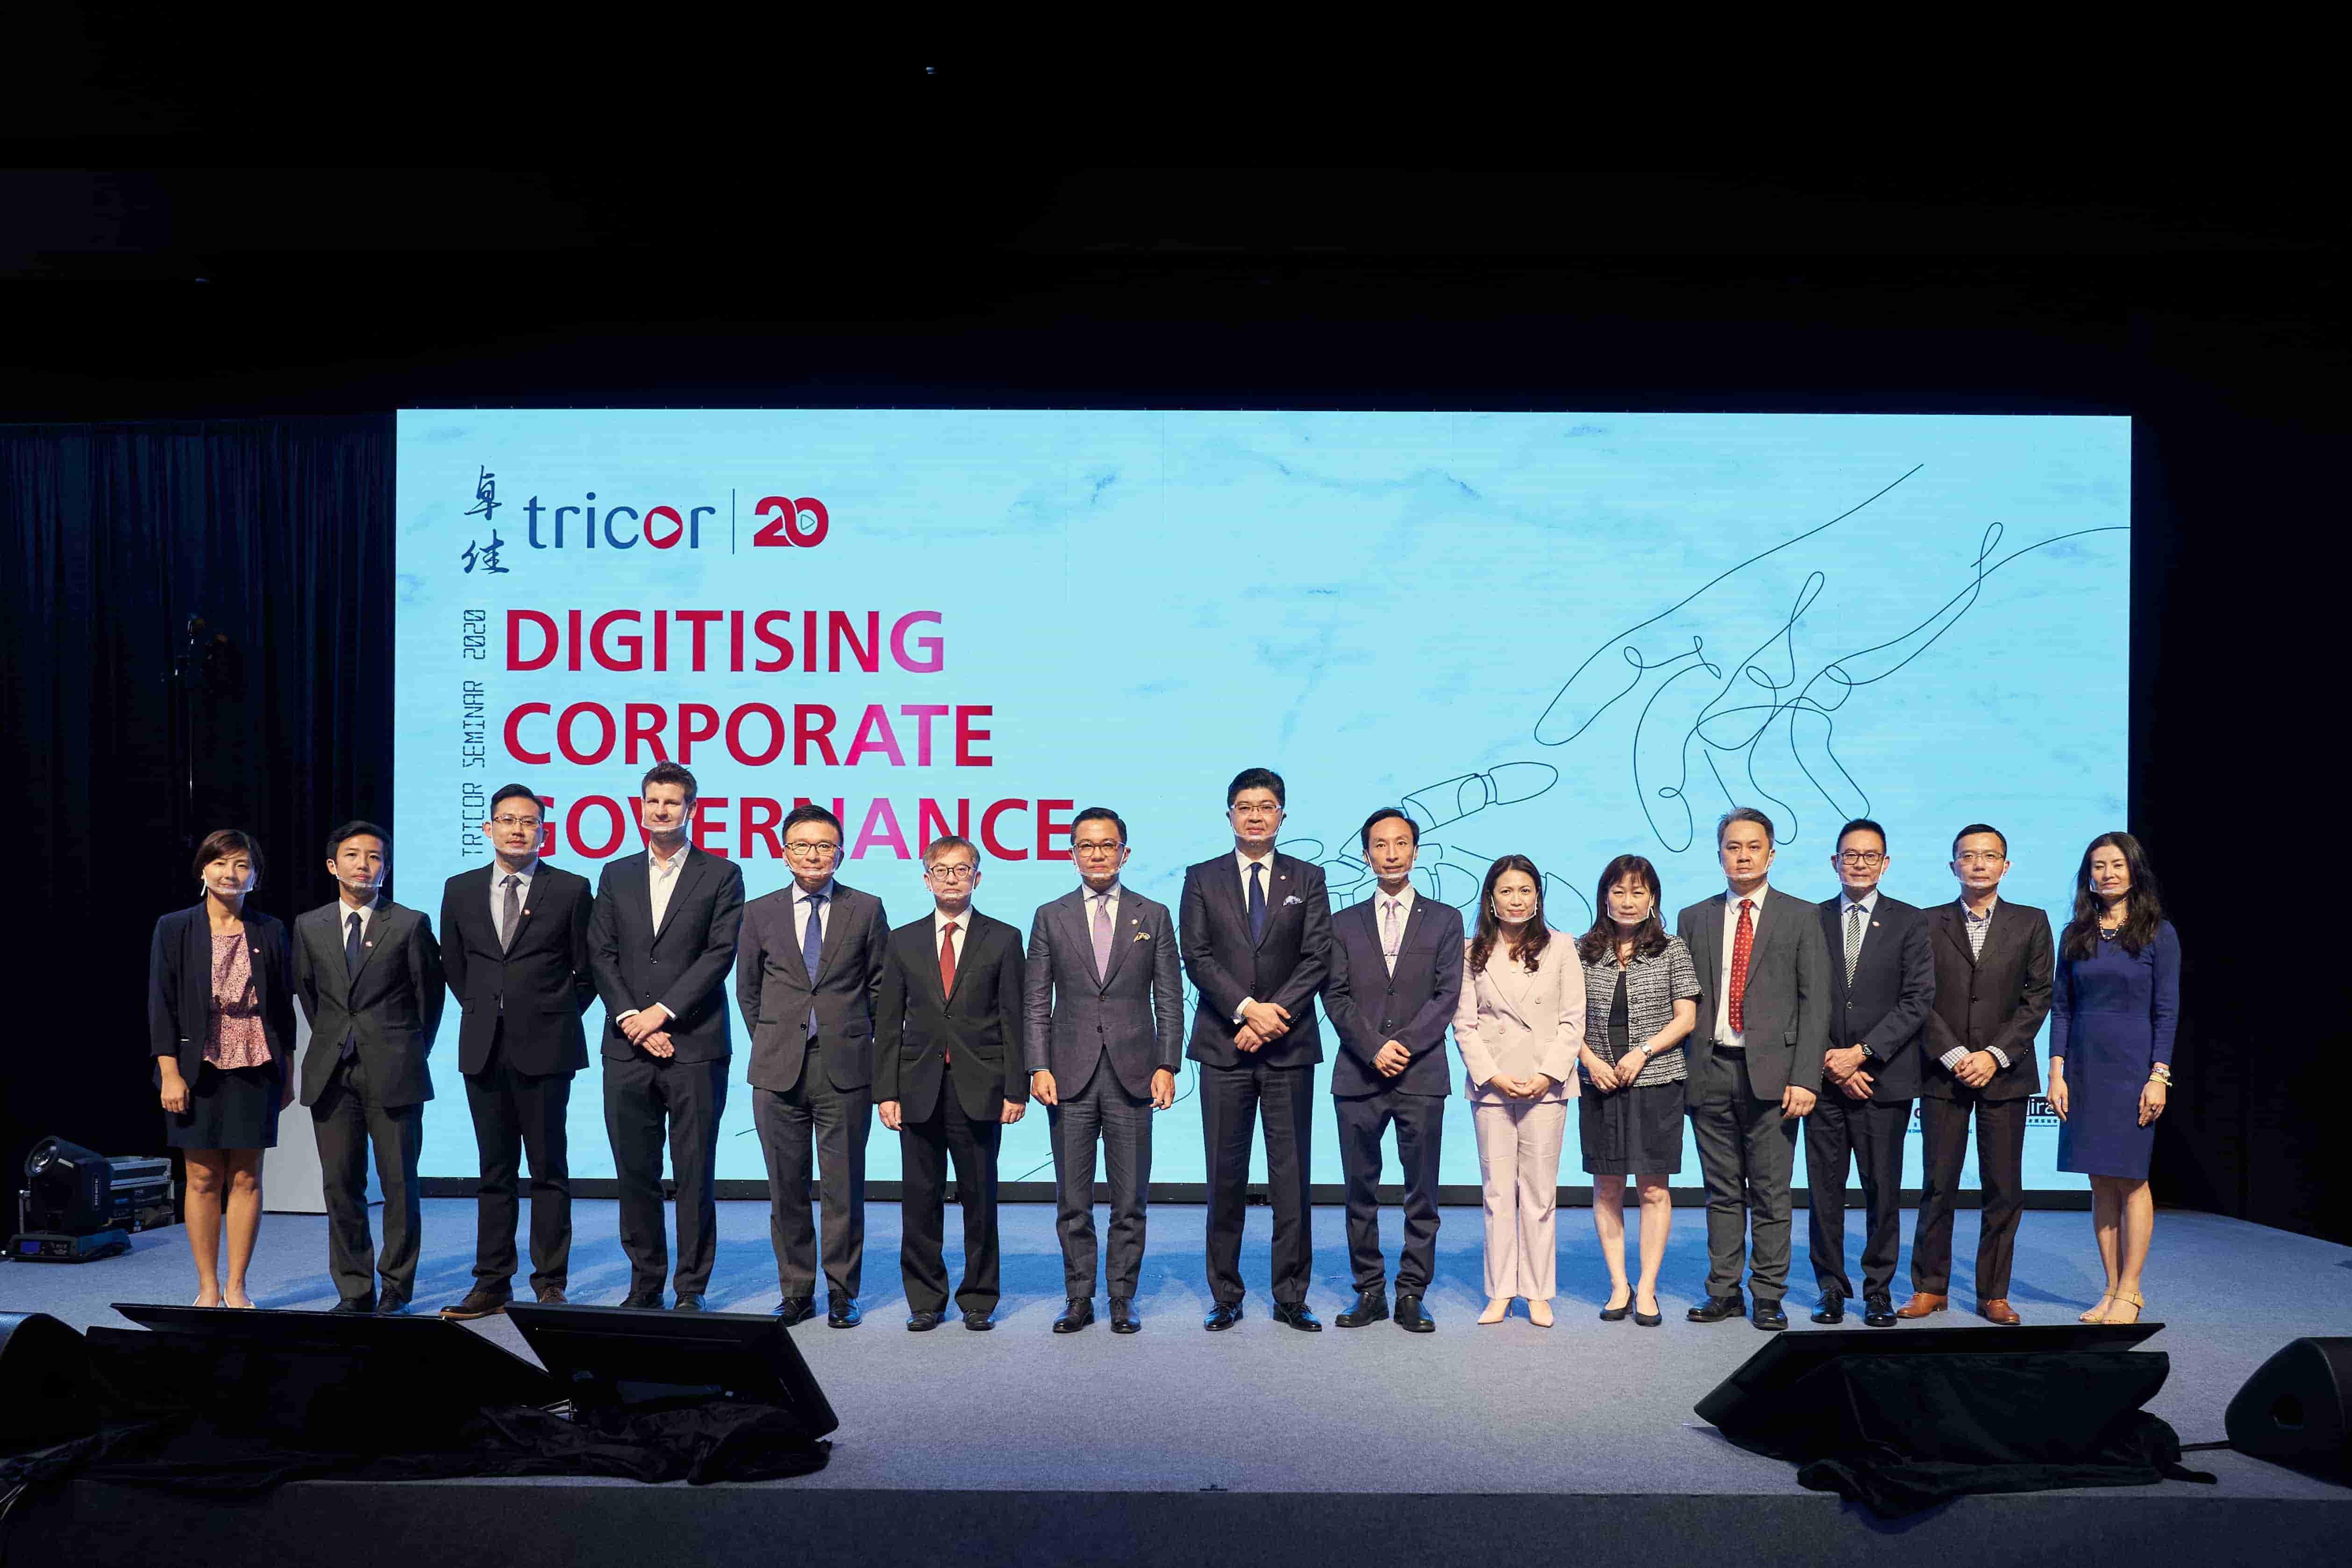 Digitising Corporate Governance - Tricor hosts 18th Annual Corporate Governance Seminar